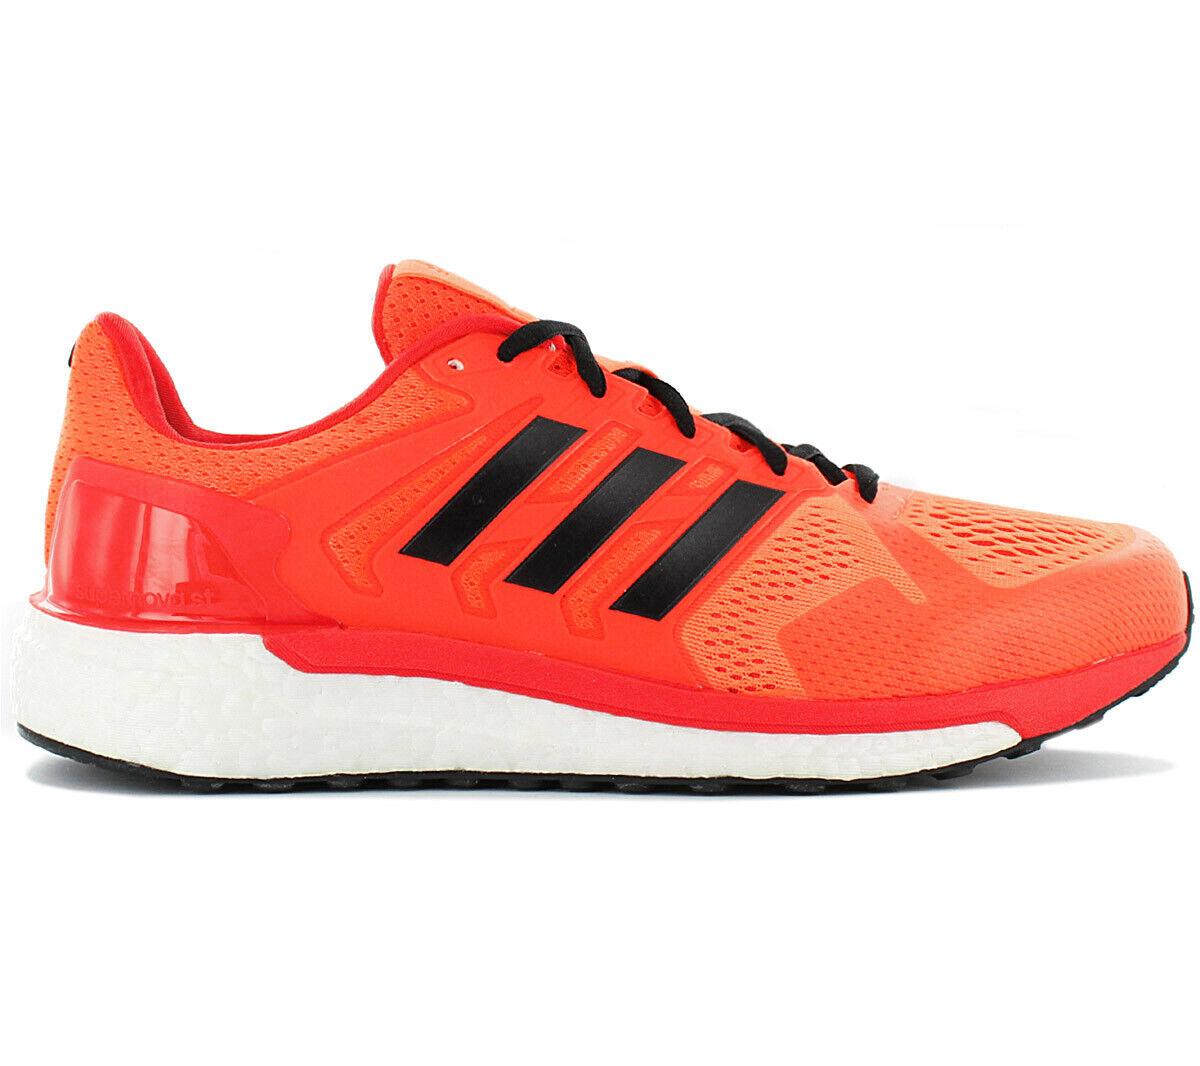 Adidas Supernova st M Boost Men's Running shoes Cg4029 Running Jogging shoes New